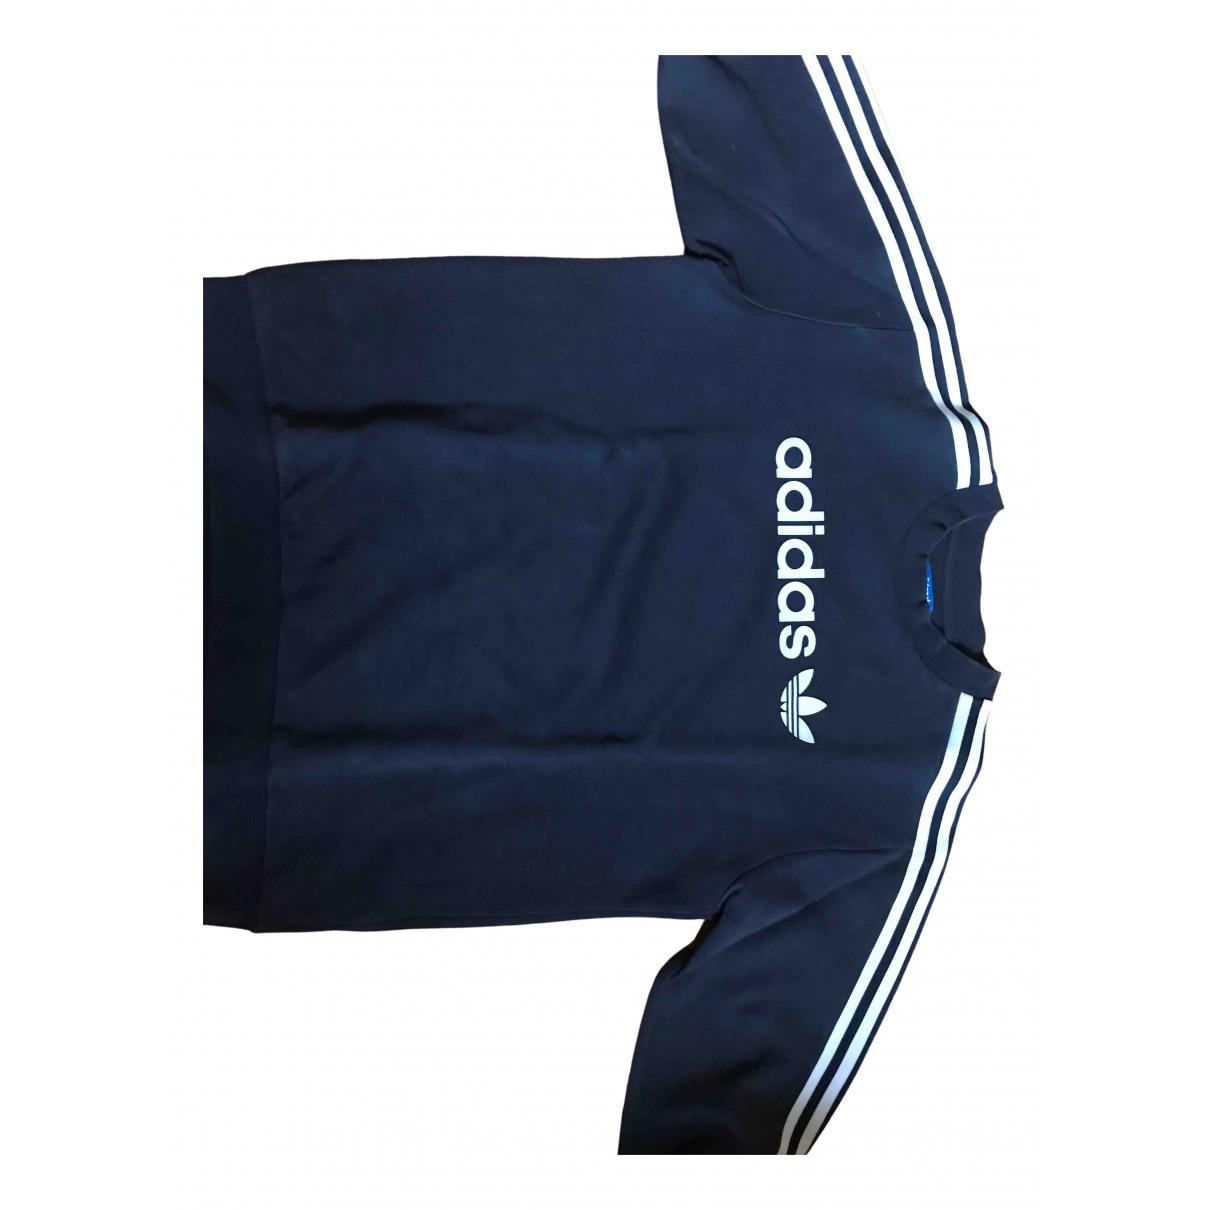 Adidas \N Black Cotton Knitwear & Sweatshirts for Men M International